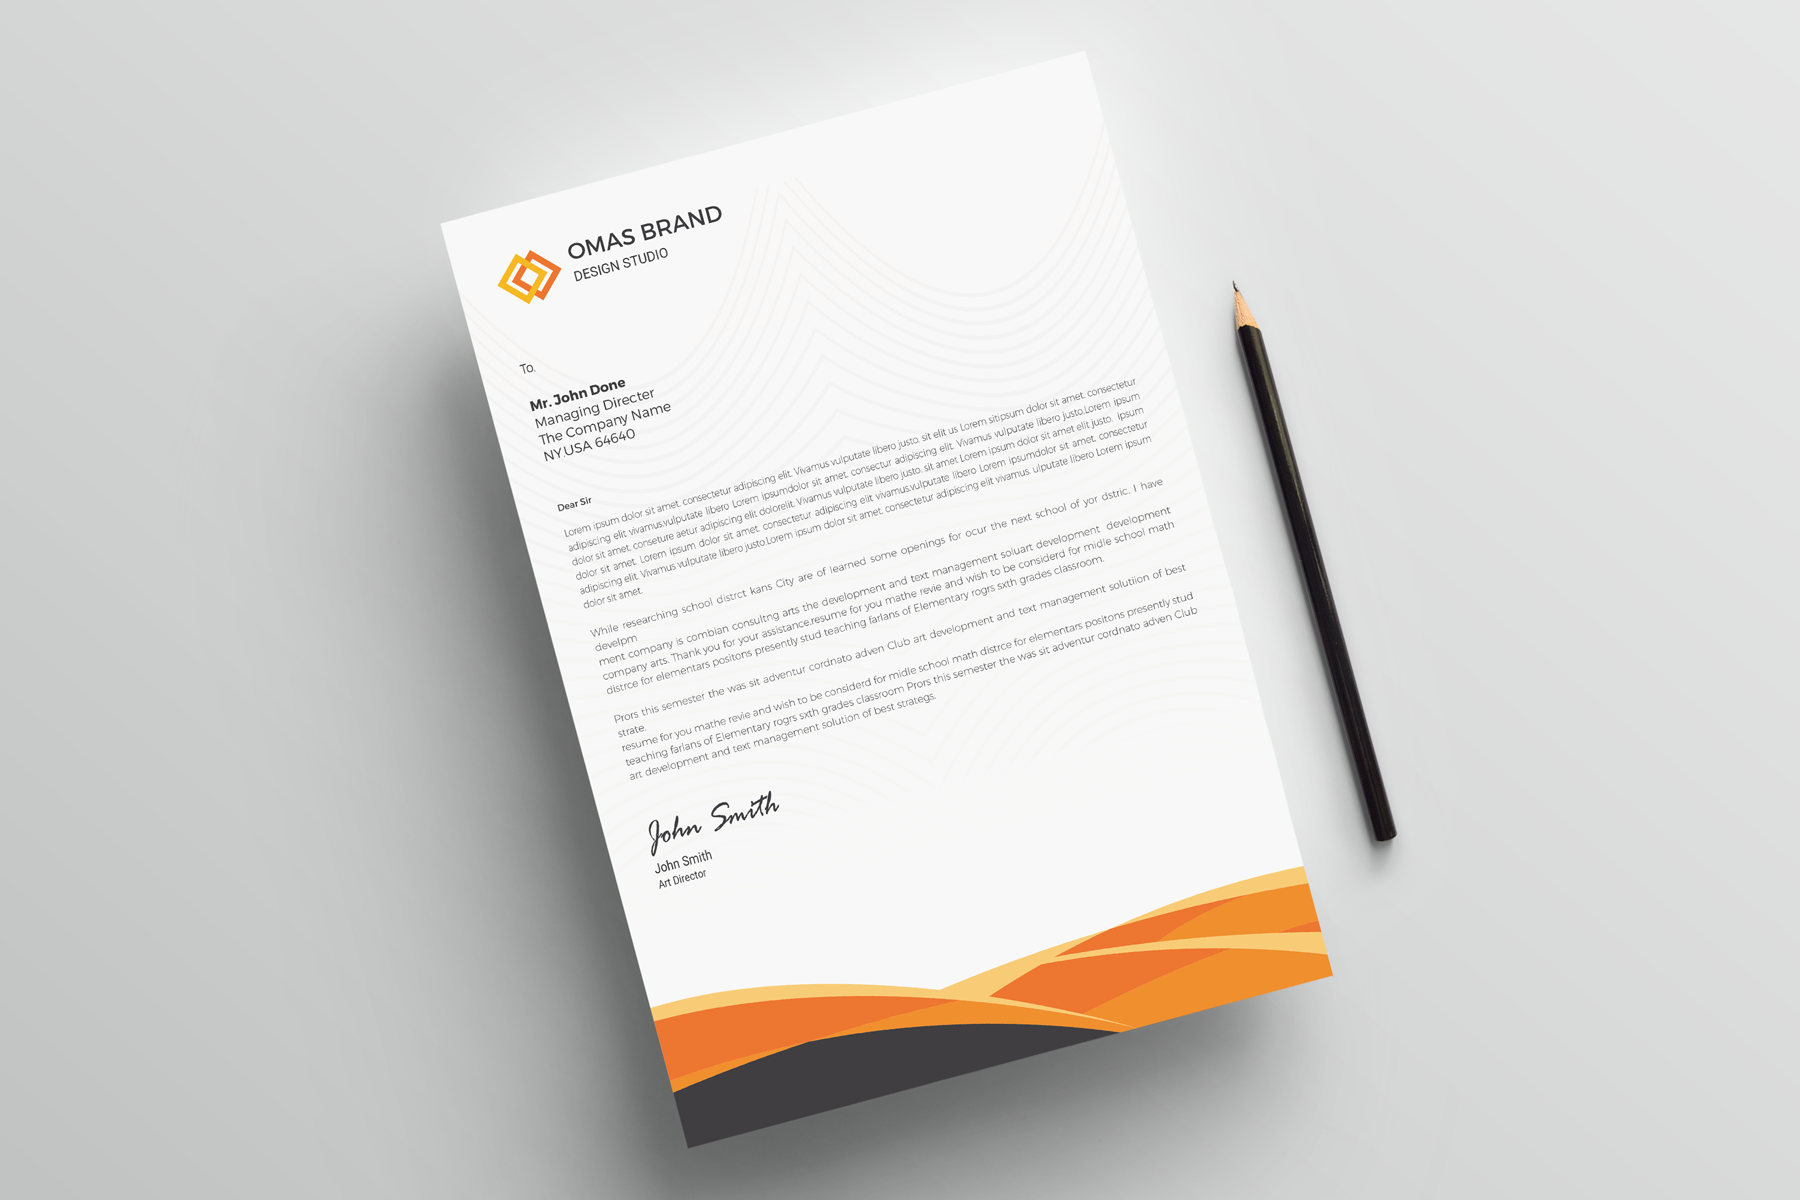 curves letterhead corporate identity template 77795 handyman resume pdf lead sales associate job description good application letter for employment